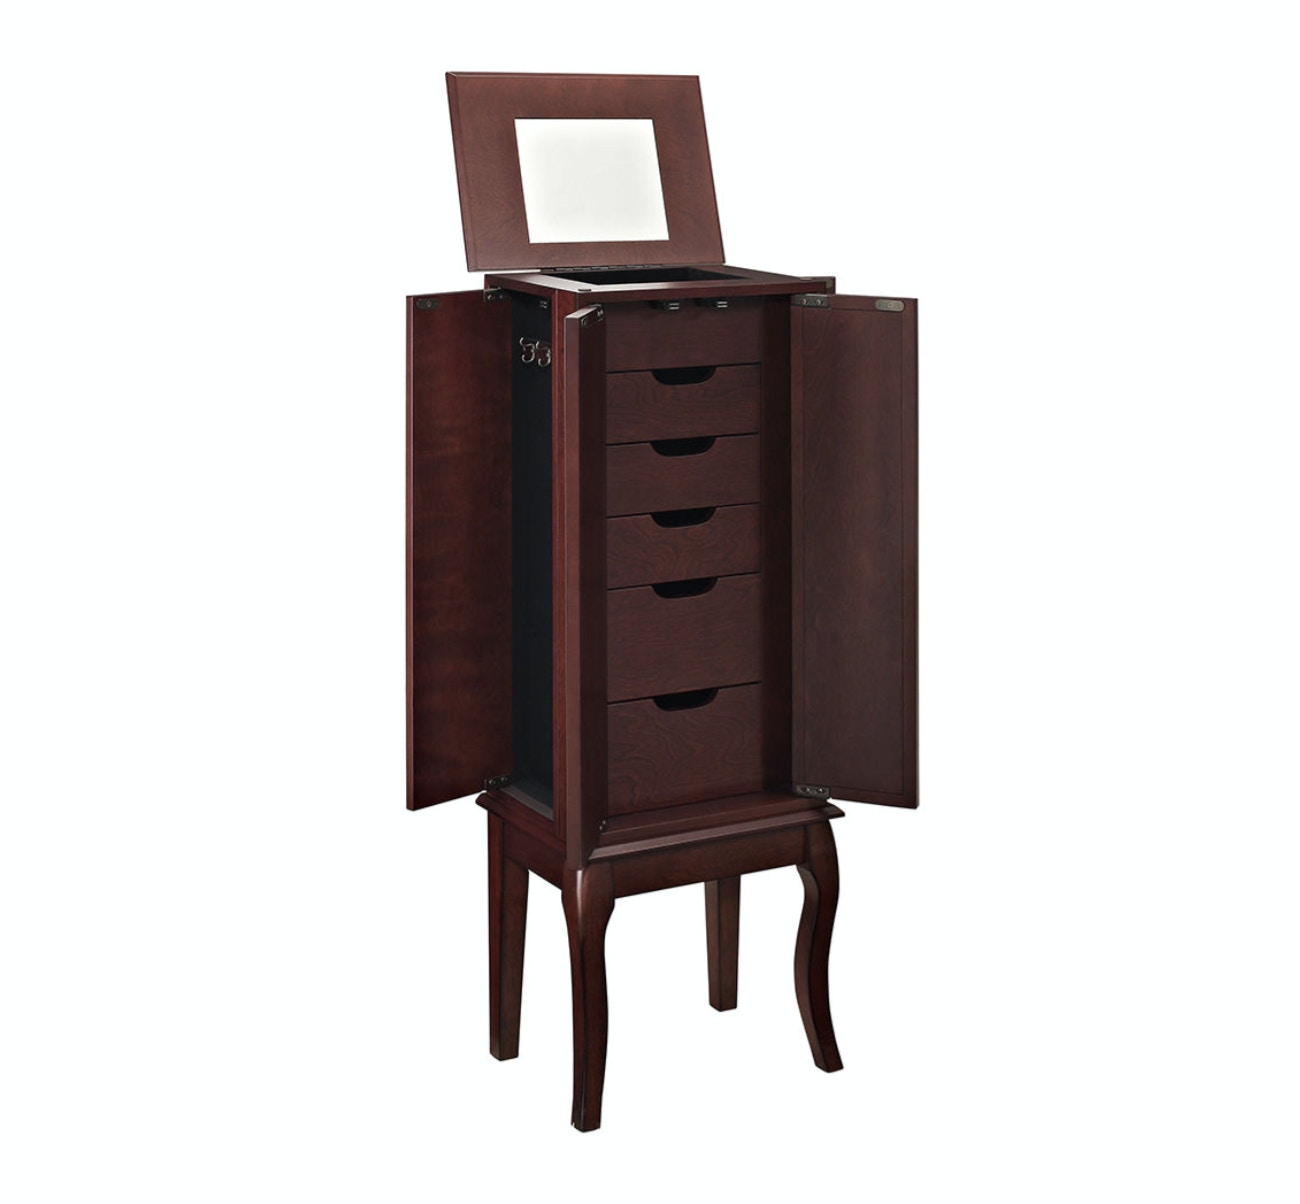 Powell Furniture Felicia Jewelry Armoire 051458